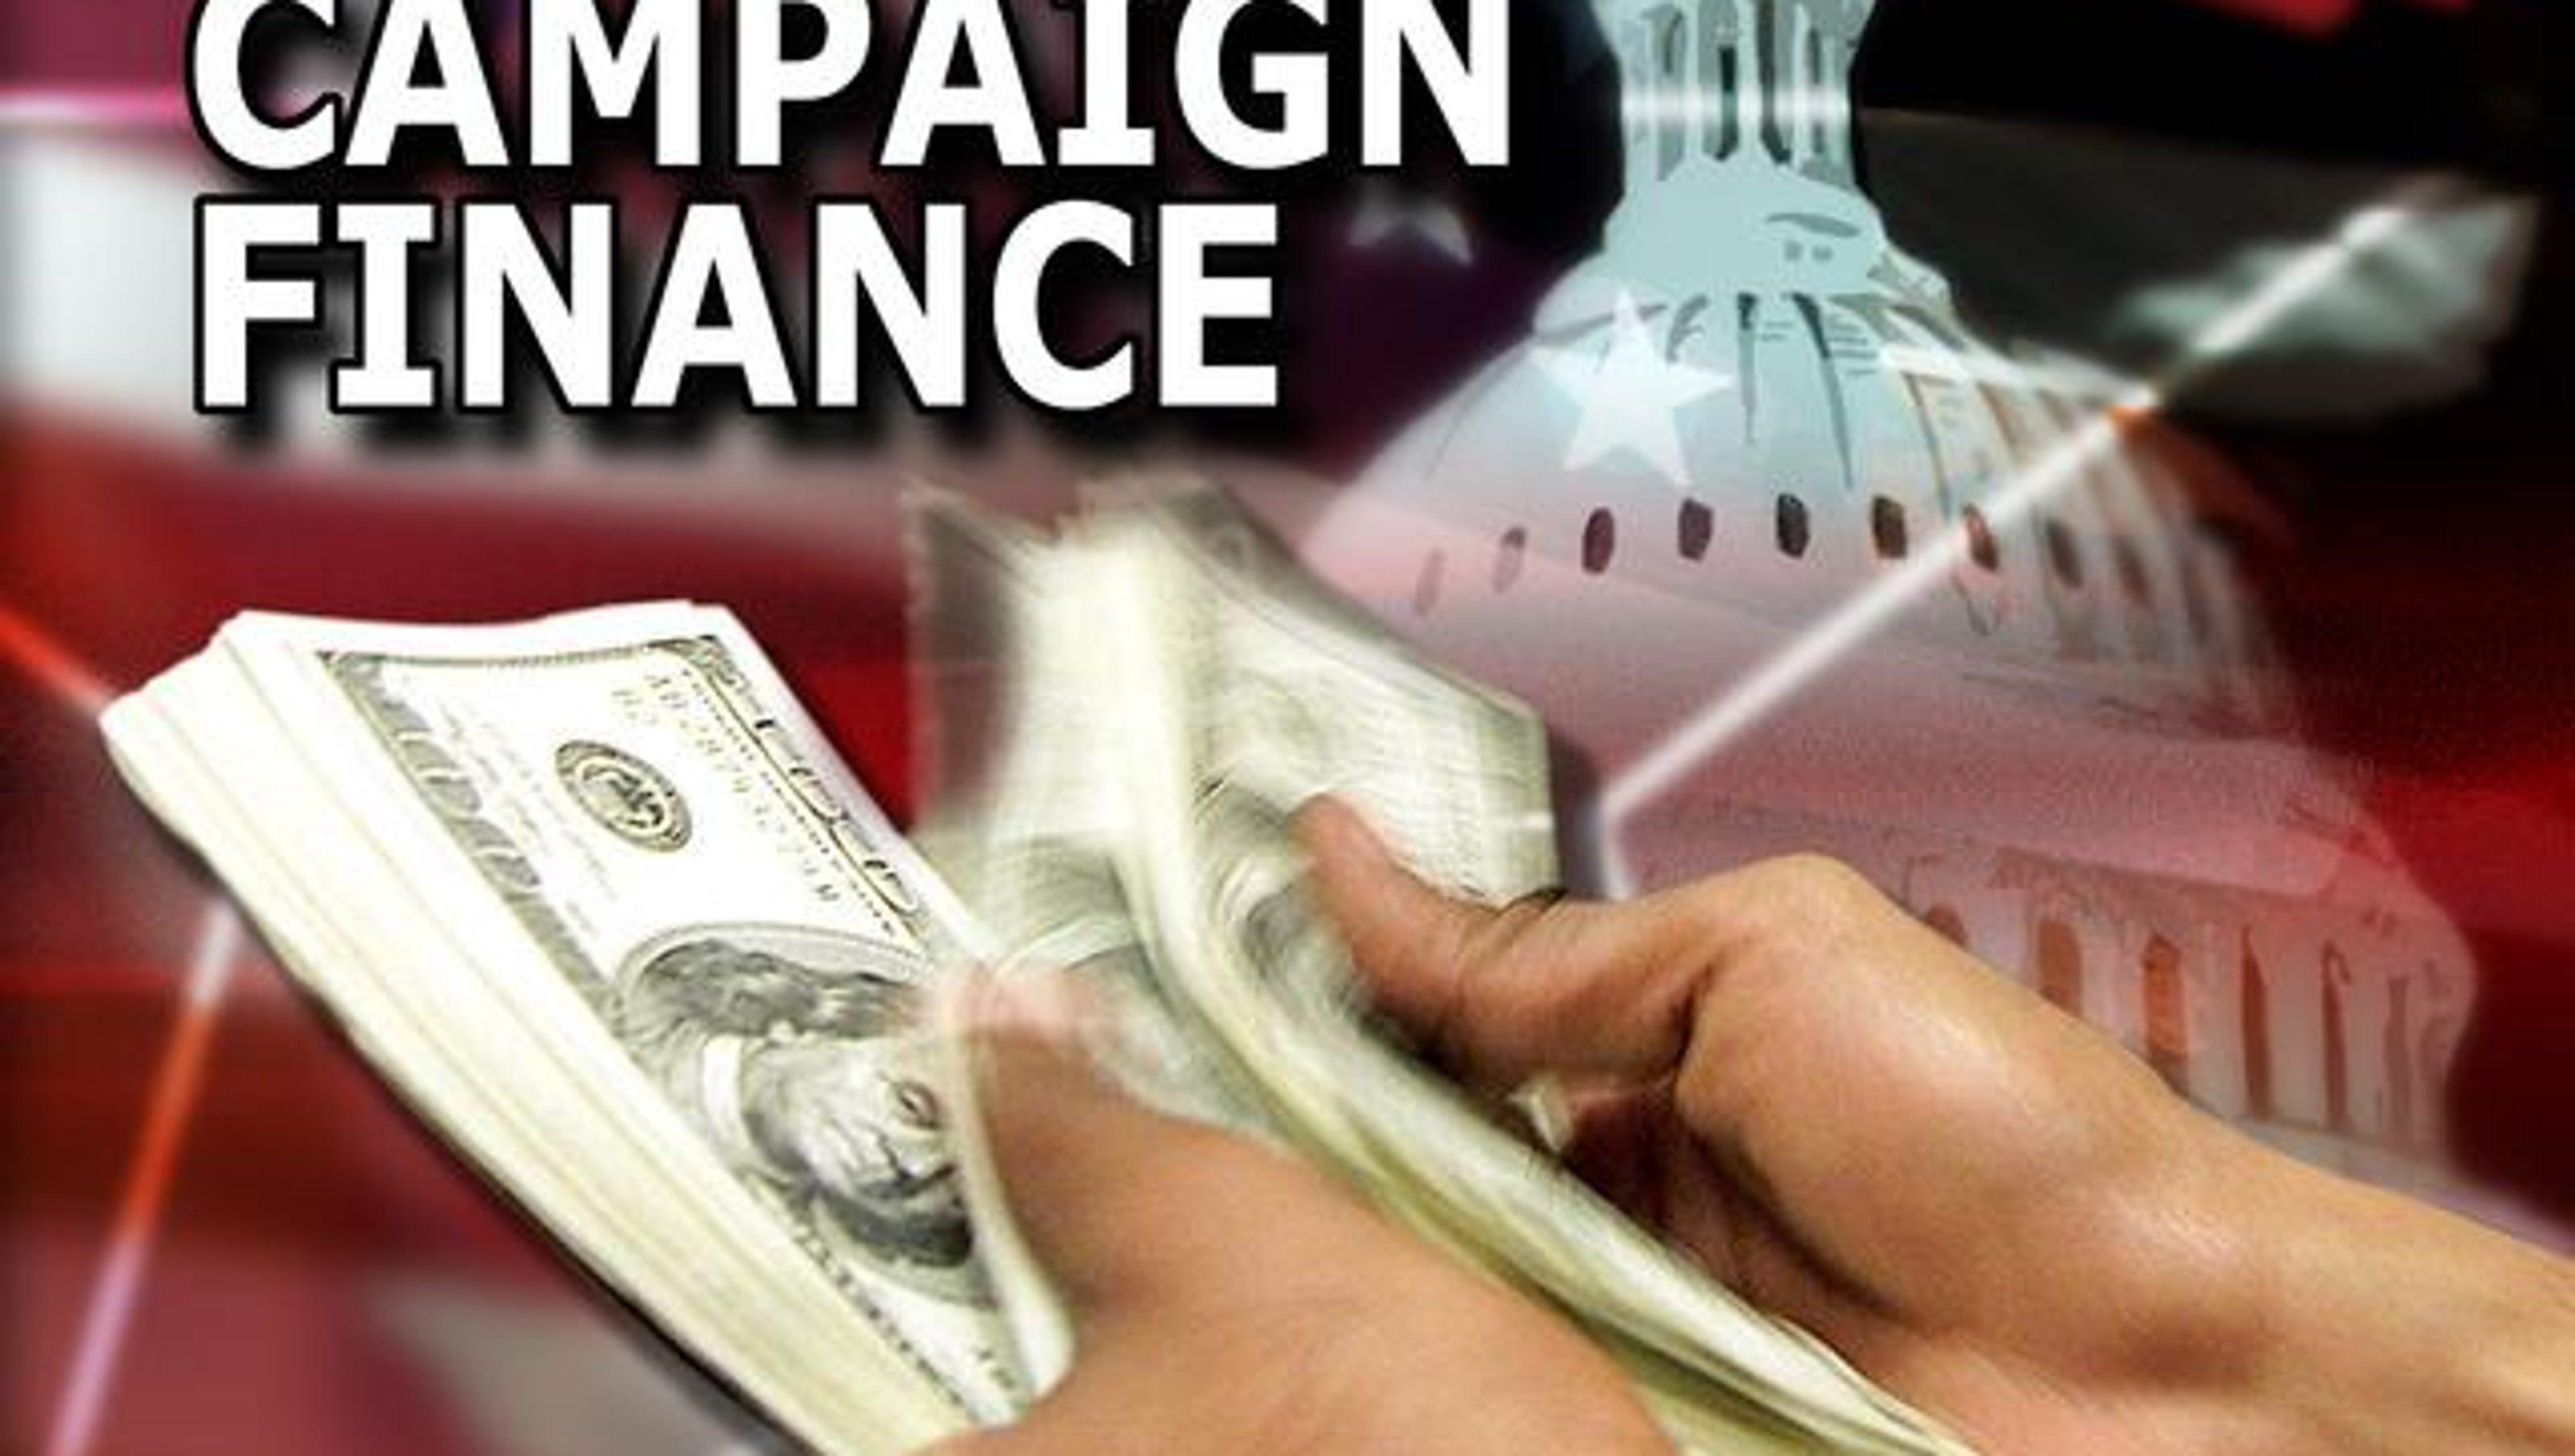 campaign finance reform proposal essay